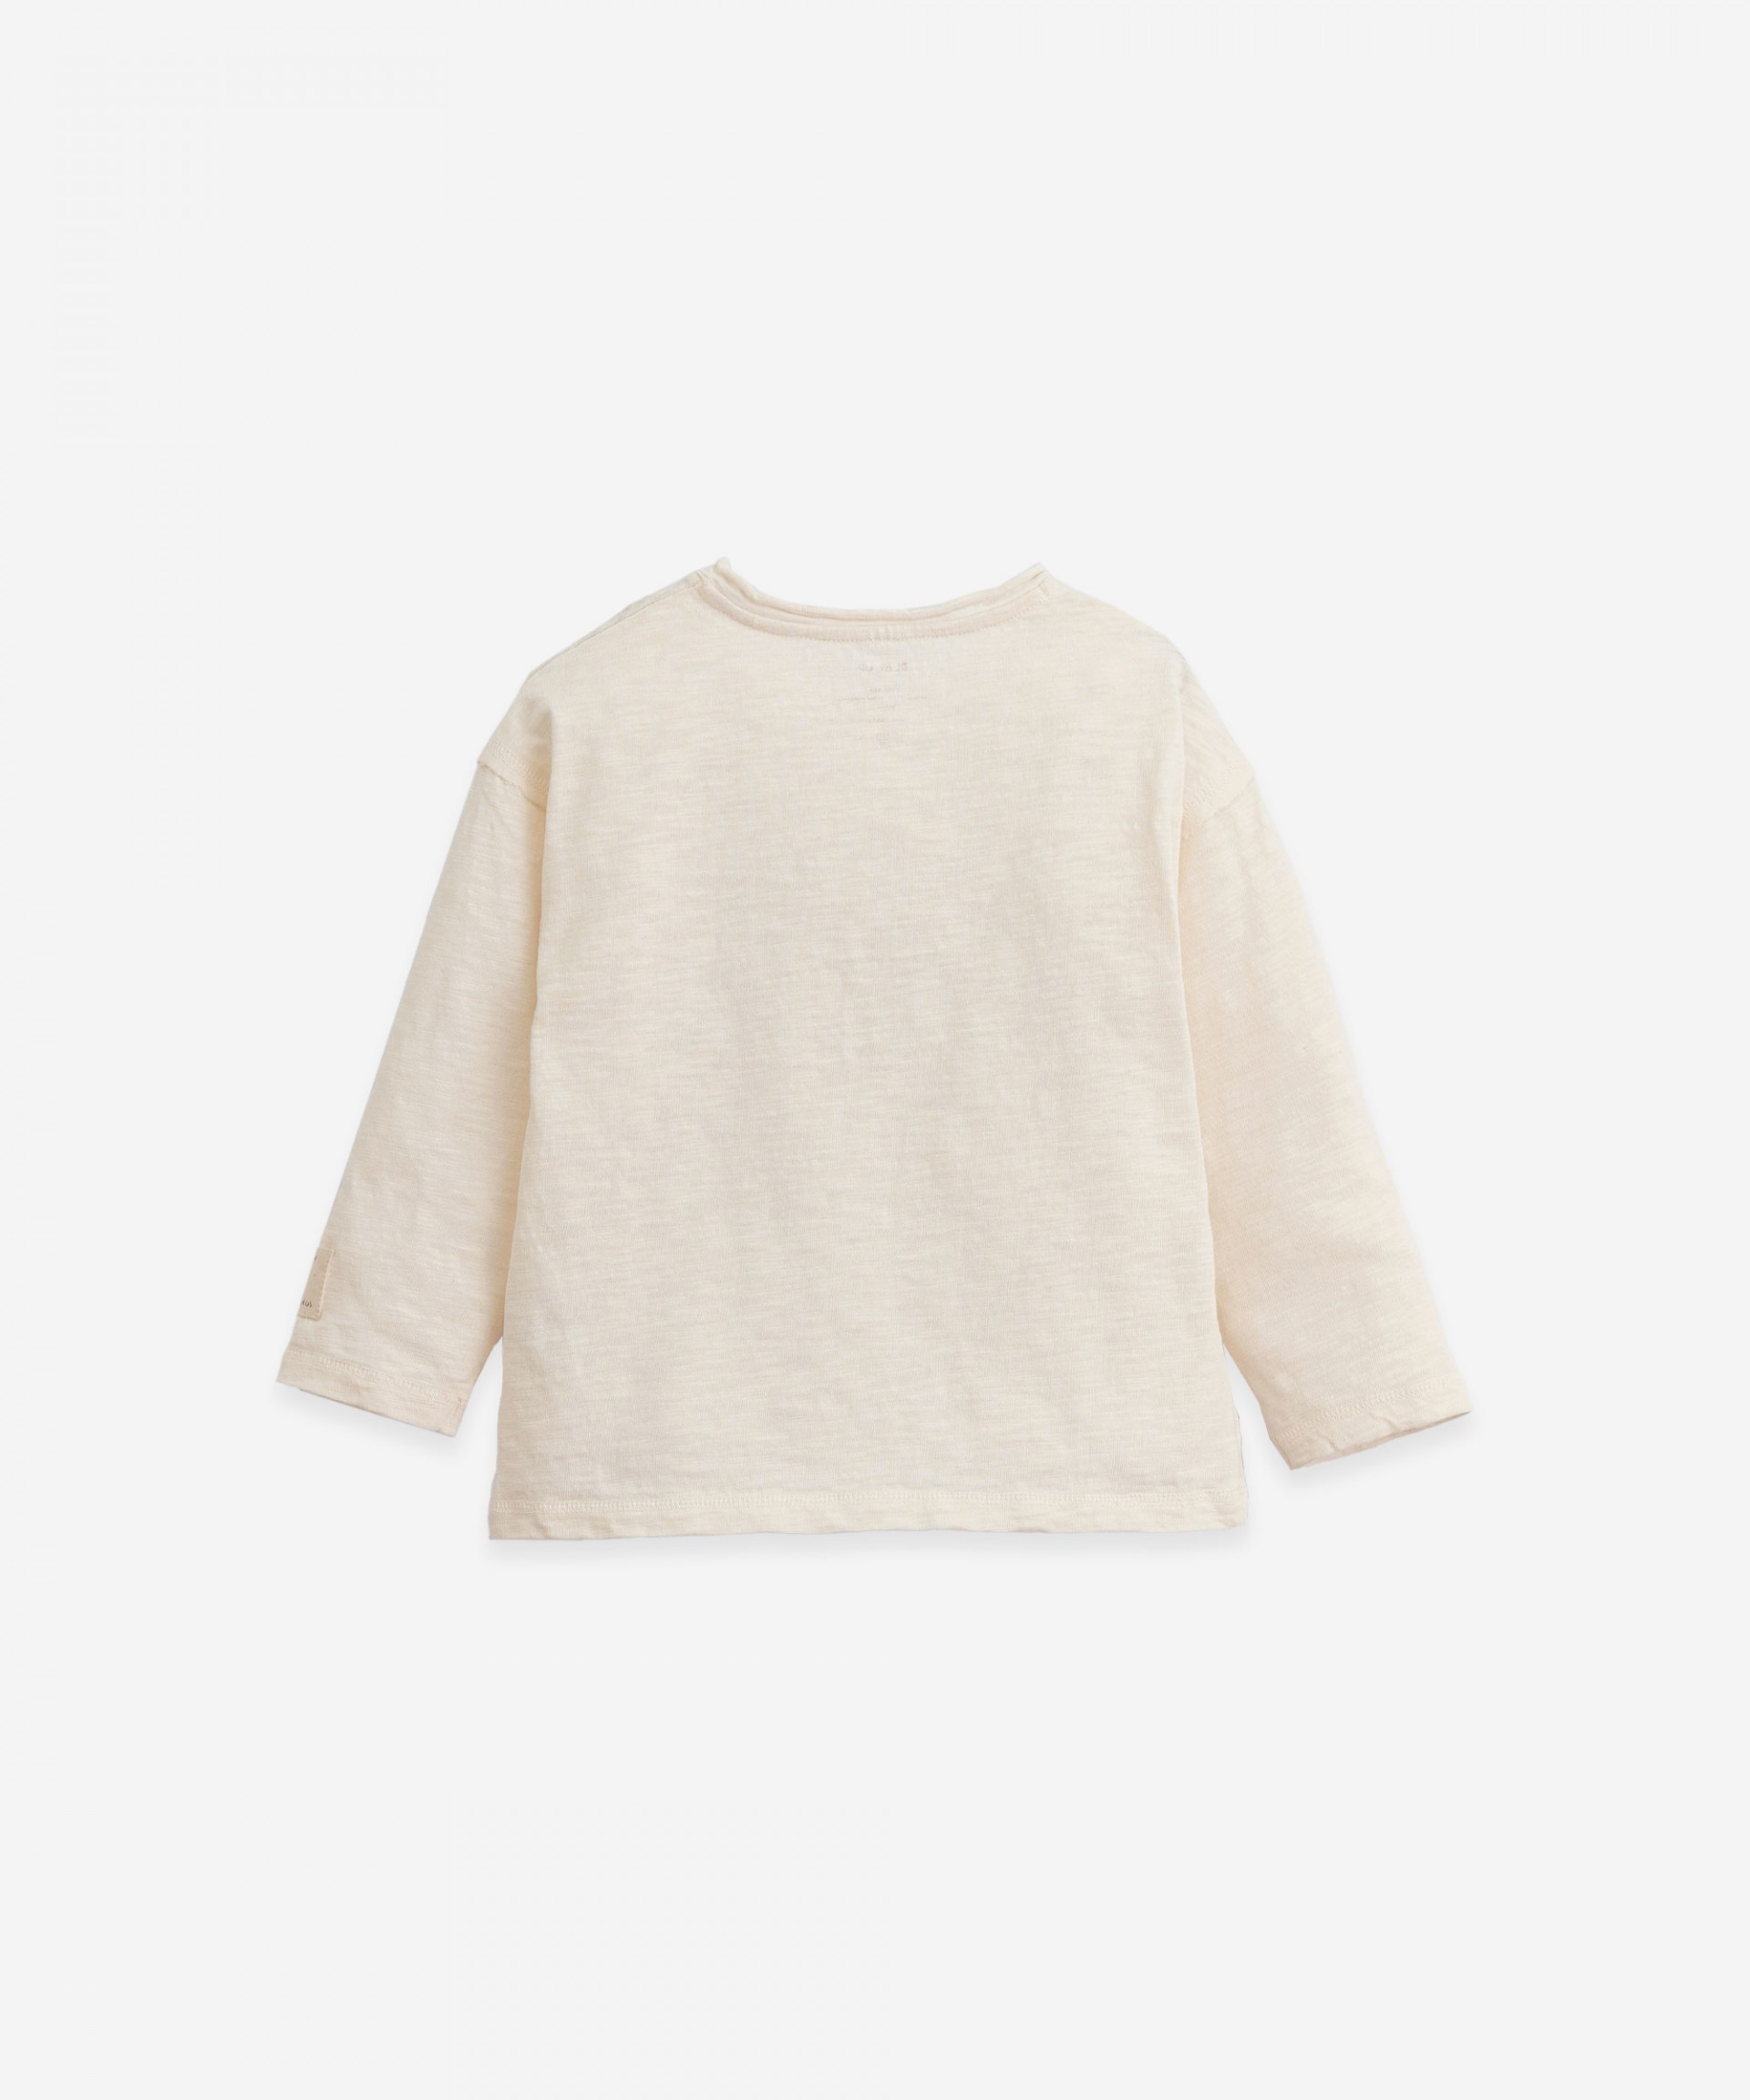 Organic cotton long-sleeve T-shirt | Botany